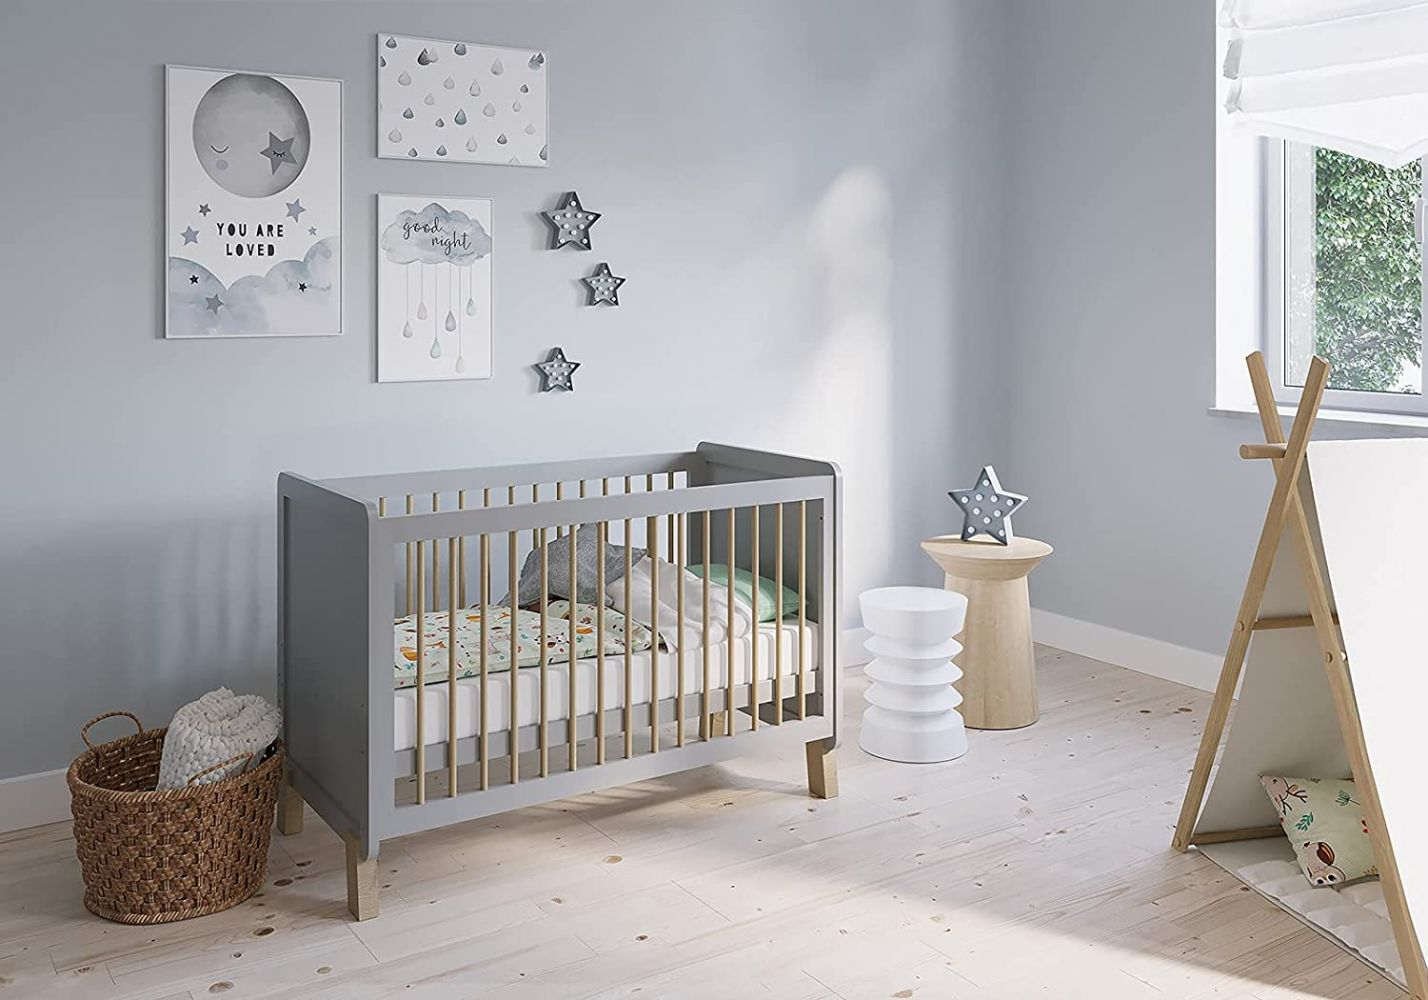 FabiMax 'Nachteule' Kinderbett, 60 x 120 cm, grau/natur, Kiefer massiv, 3-fach höhenverstellbar, umbaubar, mit Matratze Classic Bild 1